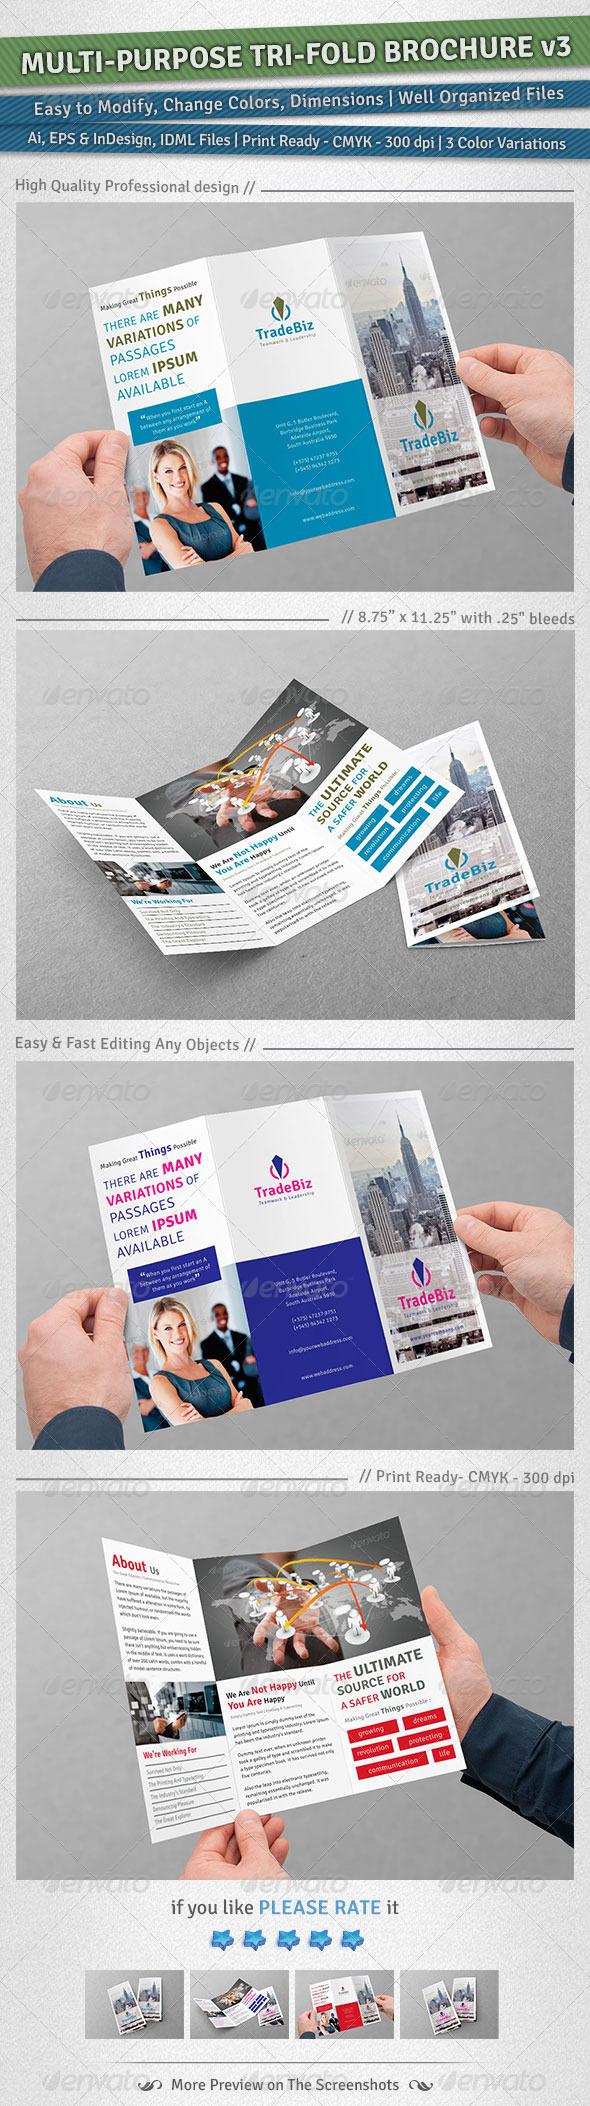 Multi-purpose Tri-Fold Brochure | Volume 3 - Corporate Brochures